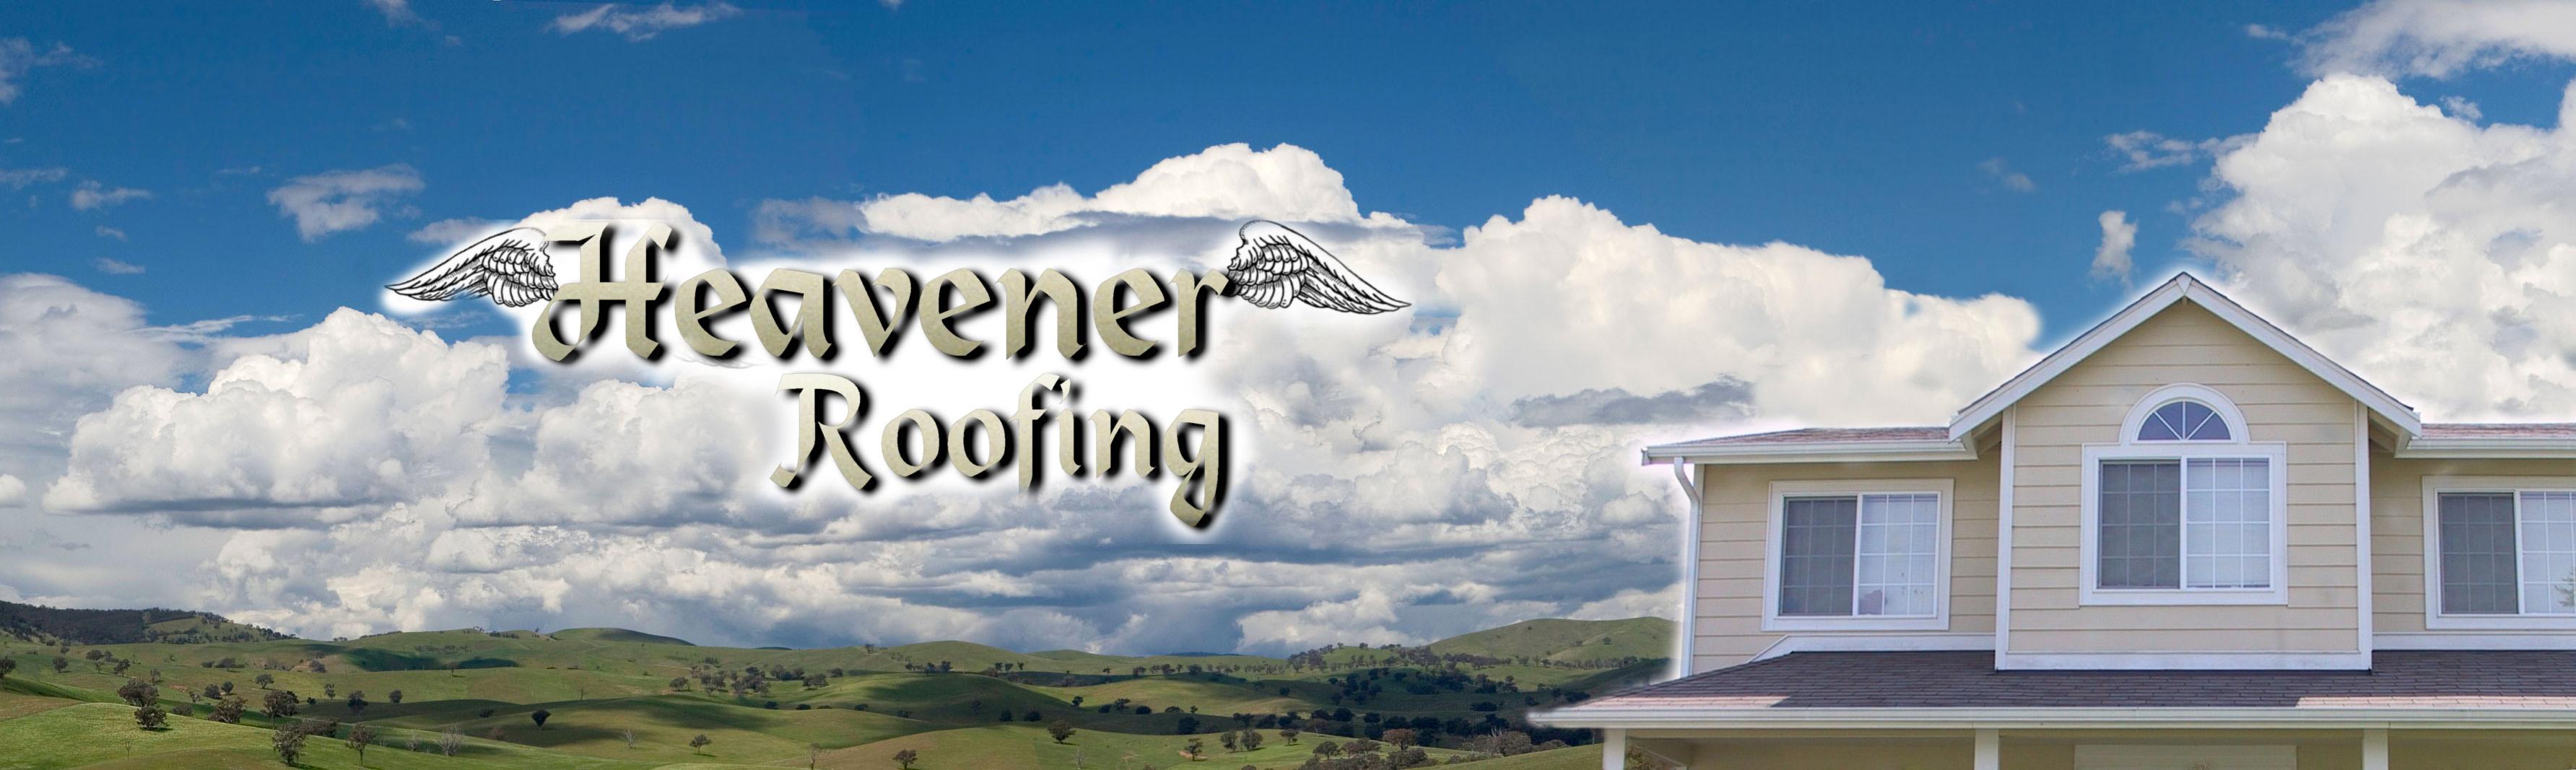 Heavener Roofing - Homestead Business Directory